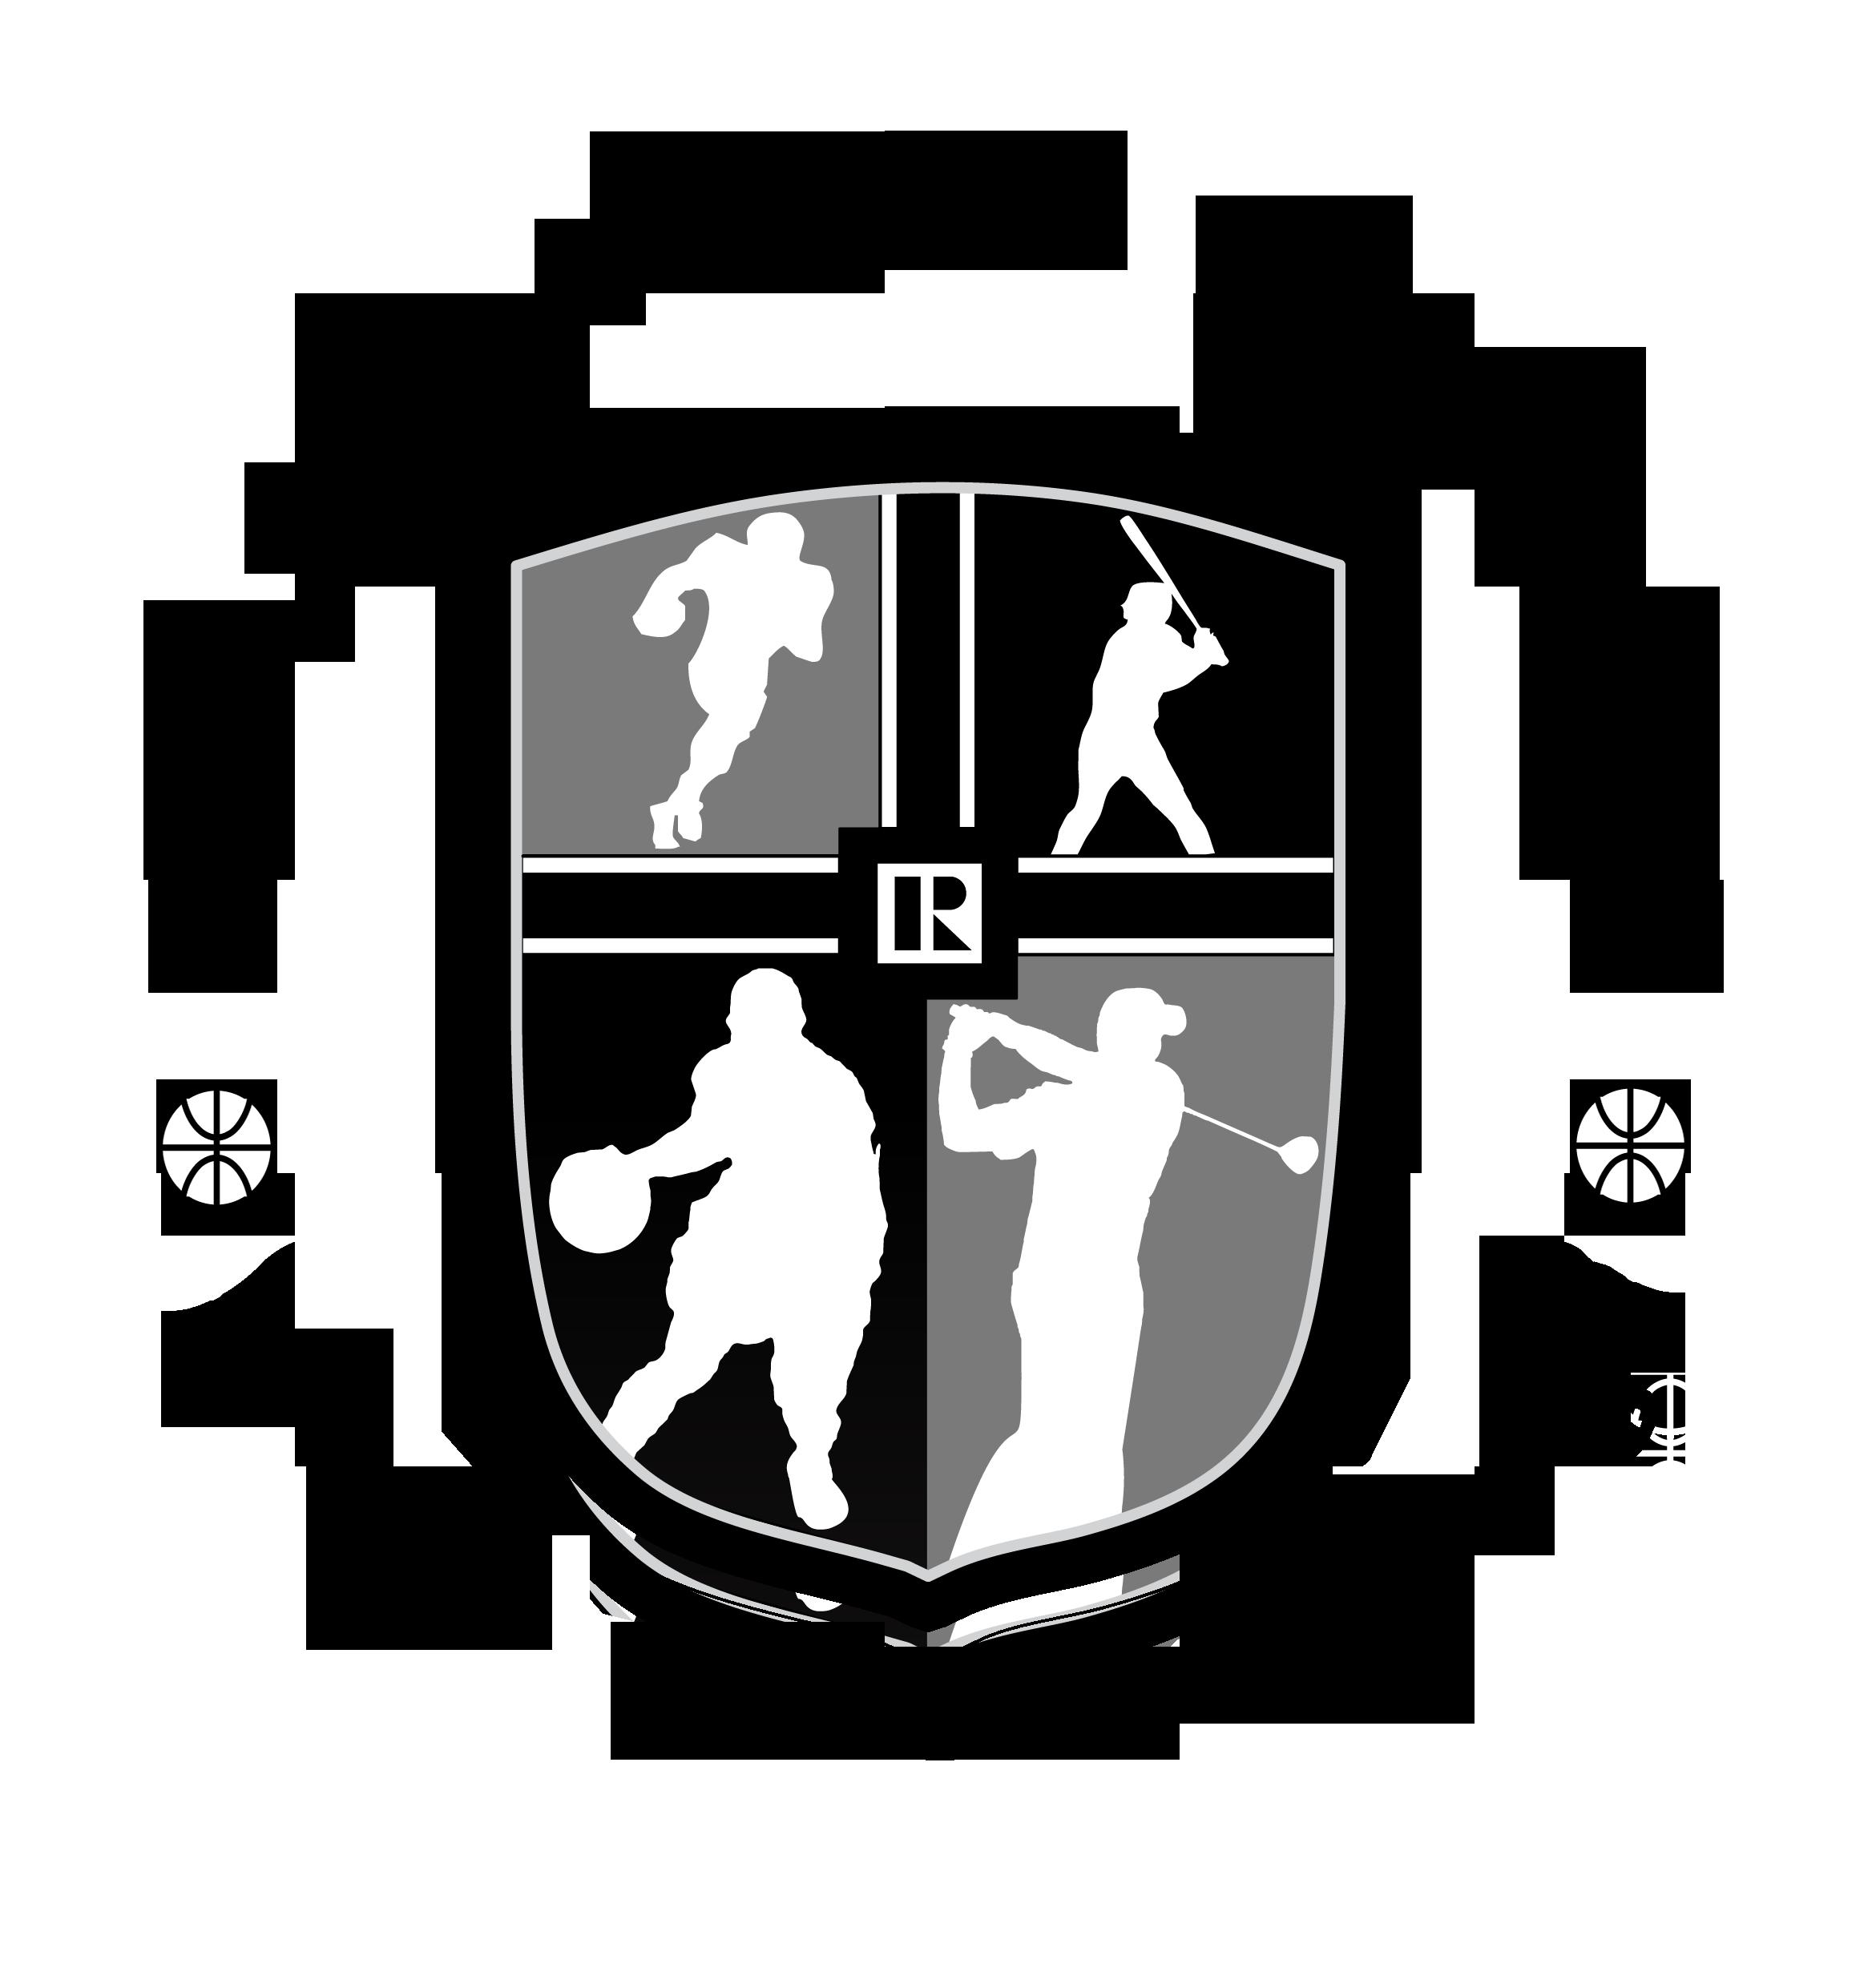 crest-00-logo-2016-blk-clr.png